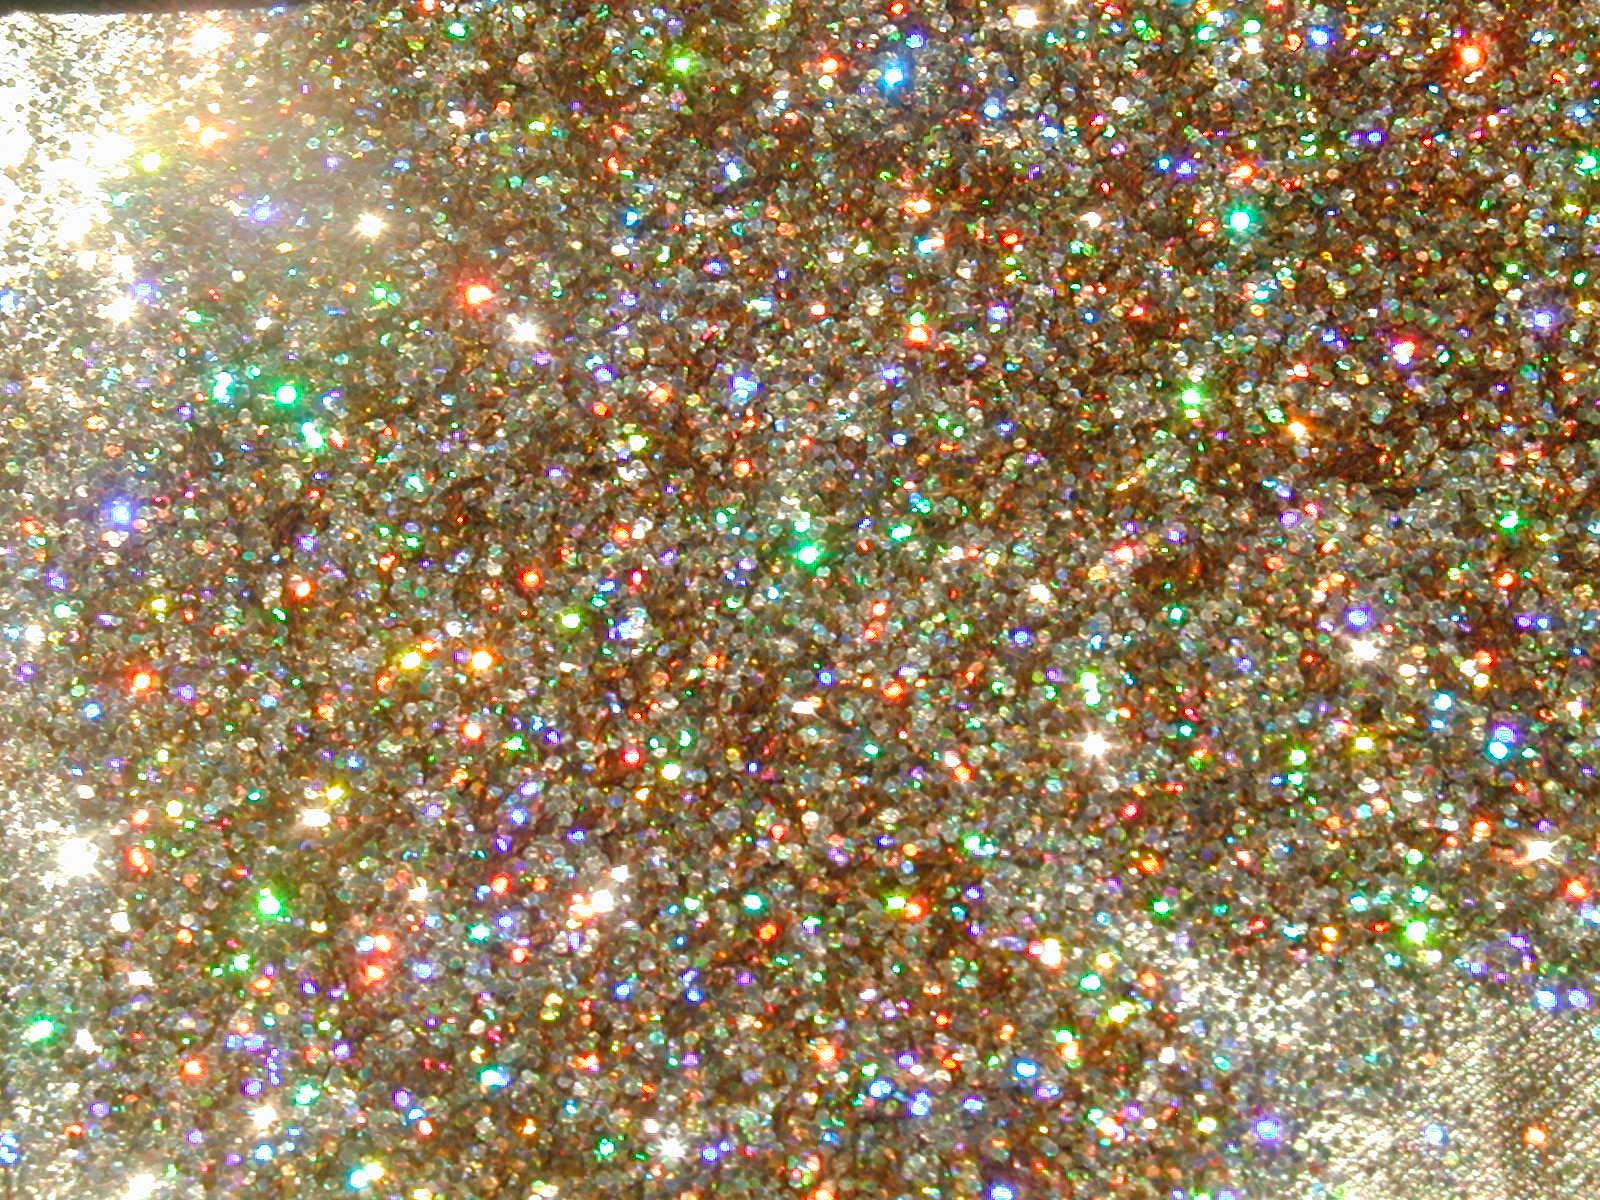 68 HD Glitter Wallpaper For Mobile And Desktop 1600x1200